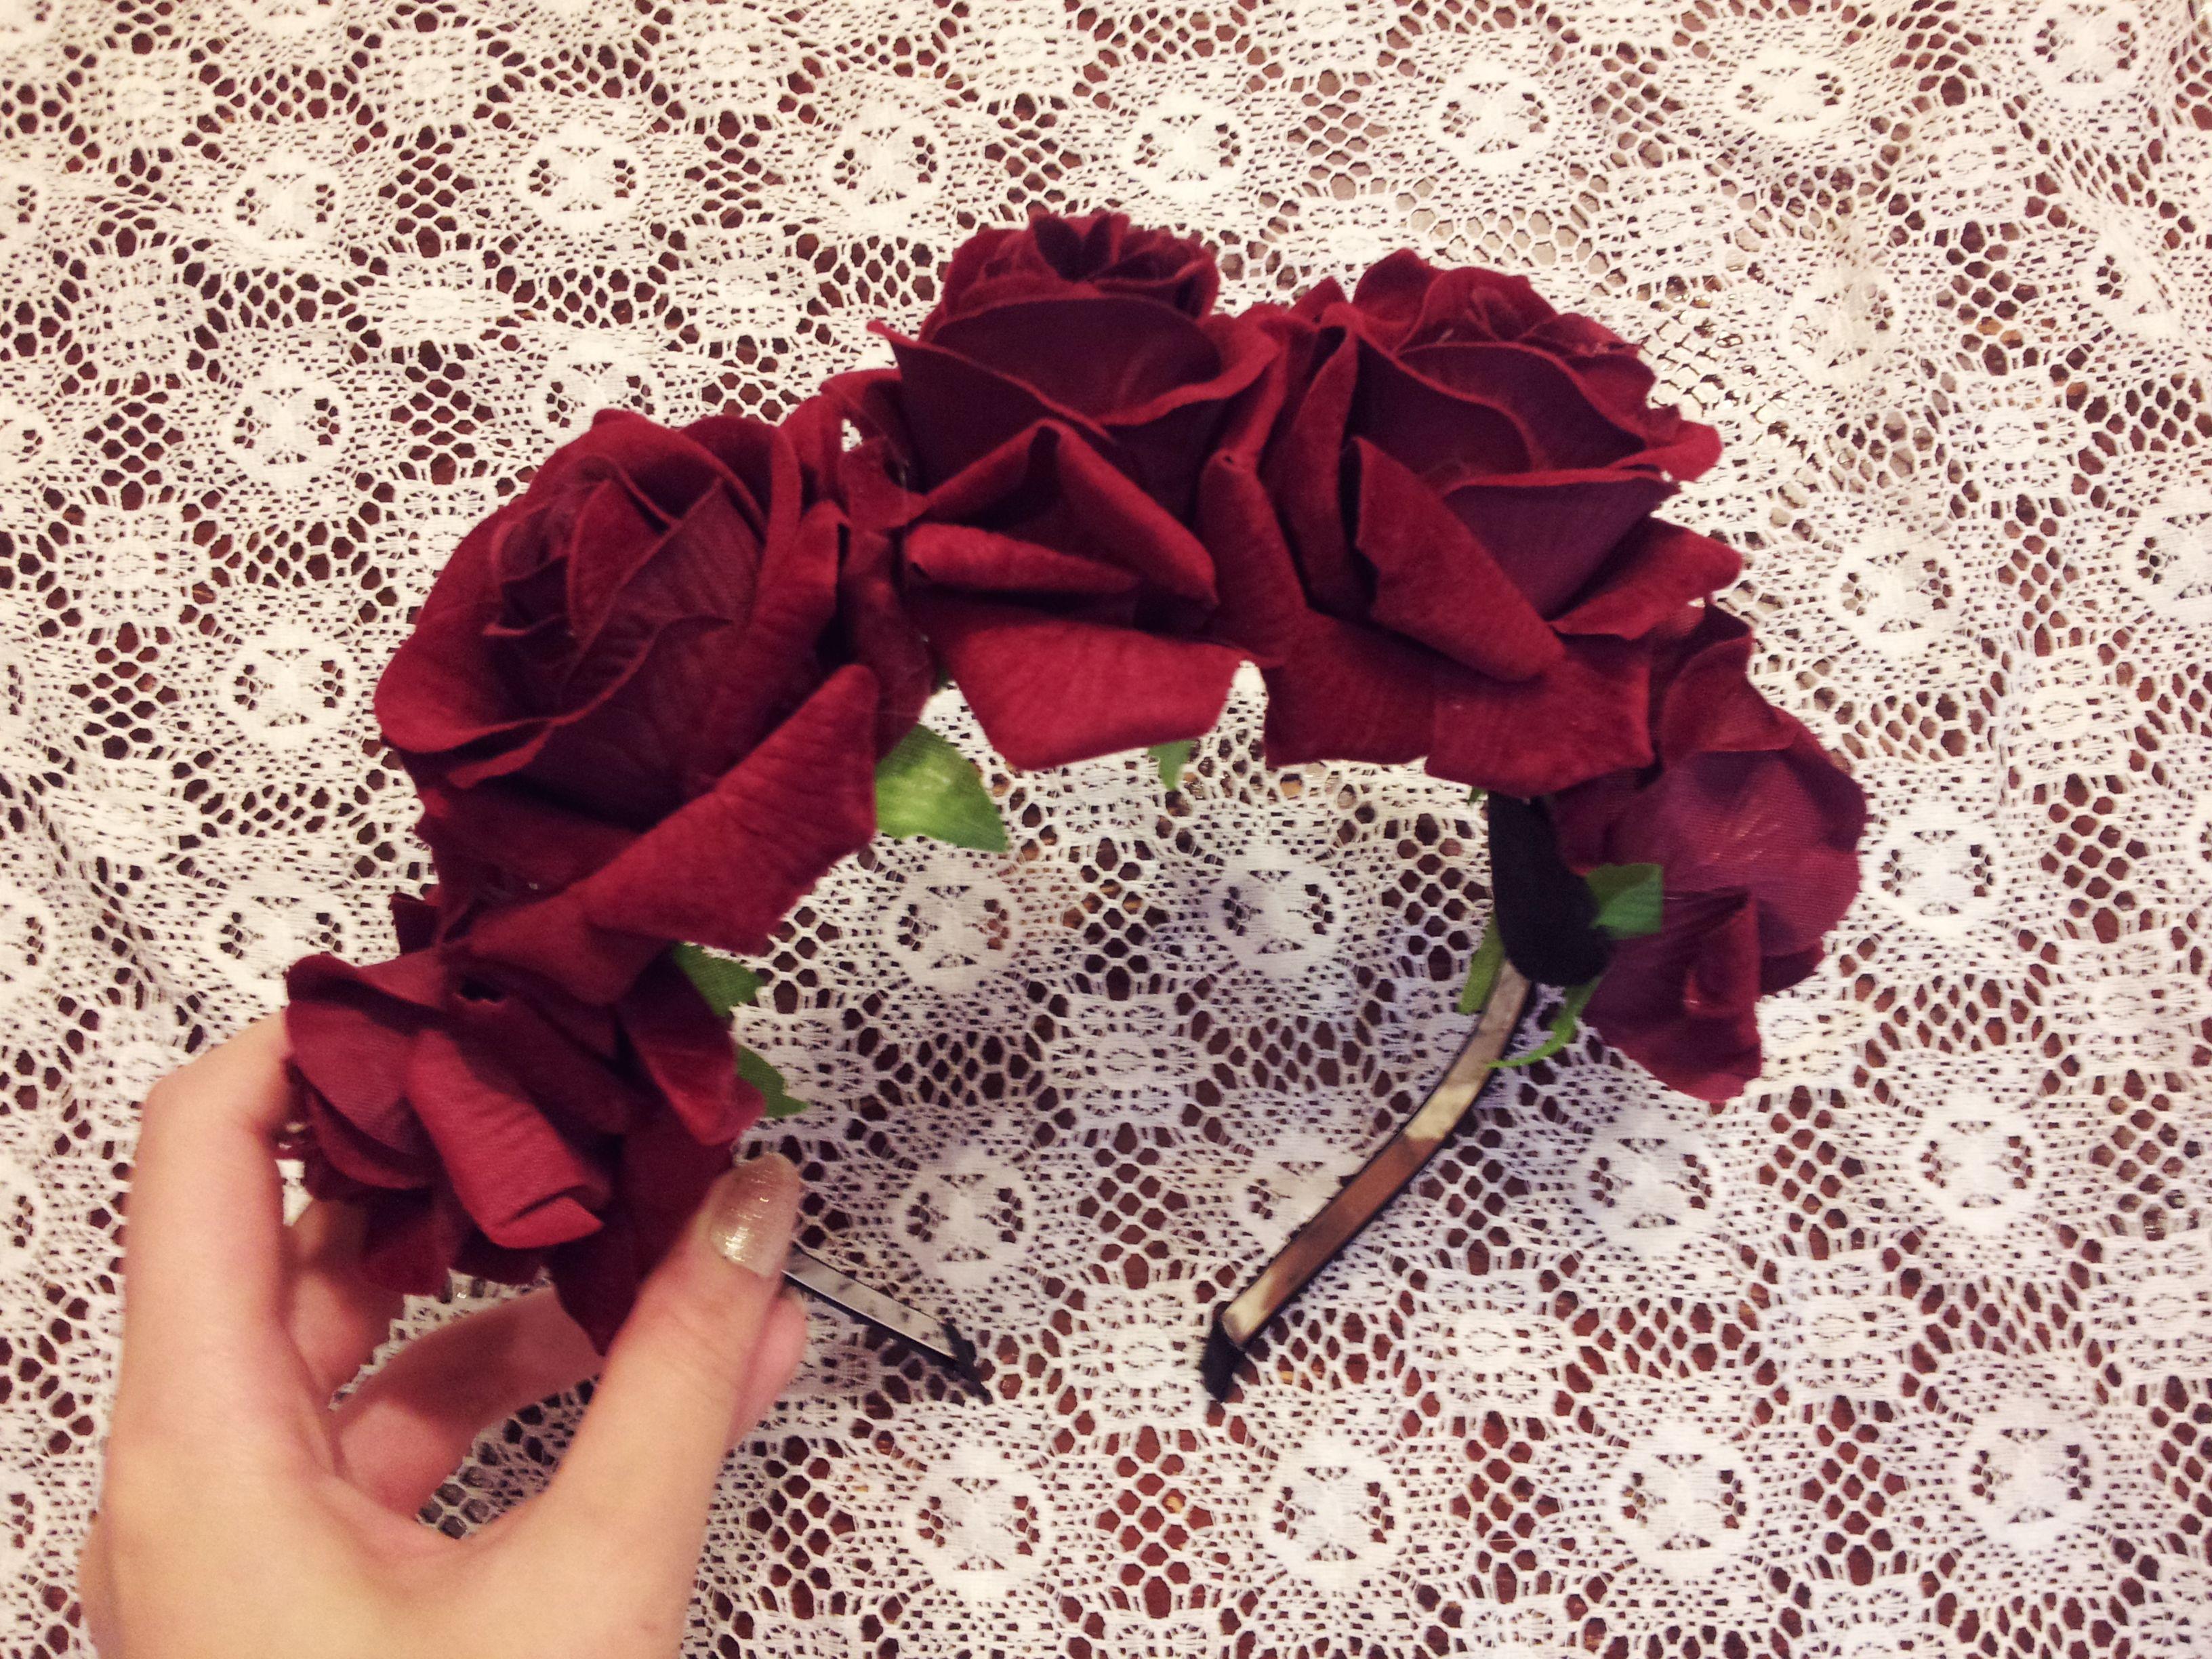 Dark Rose Flower Crown · CassieRose · Online Store Powered by Storenvy 6096451f07b